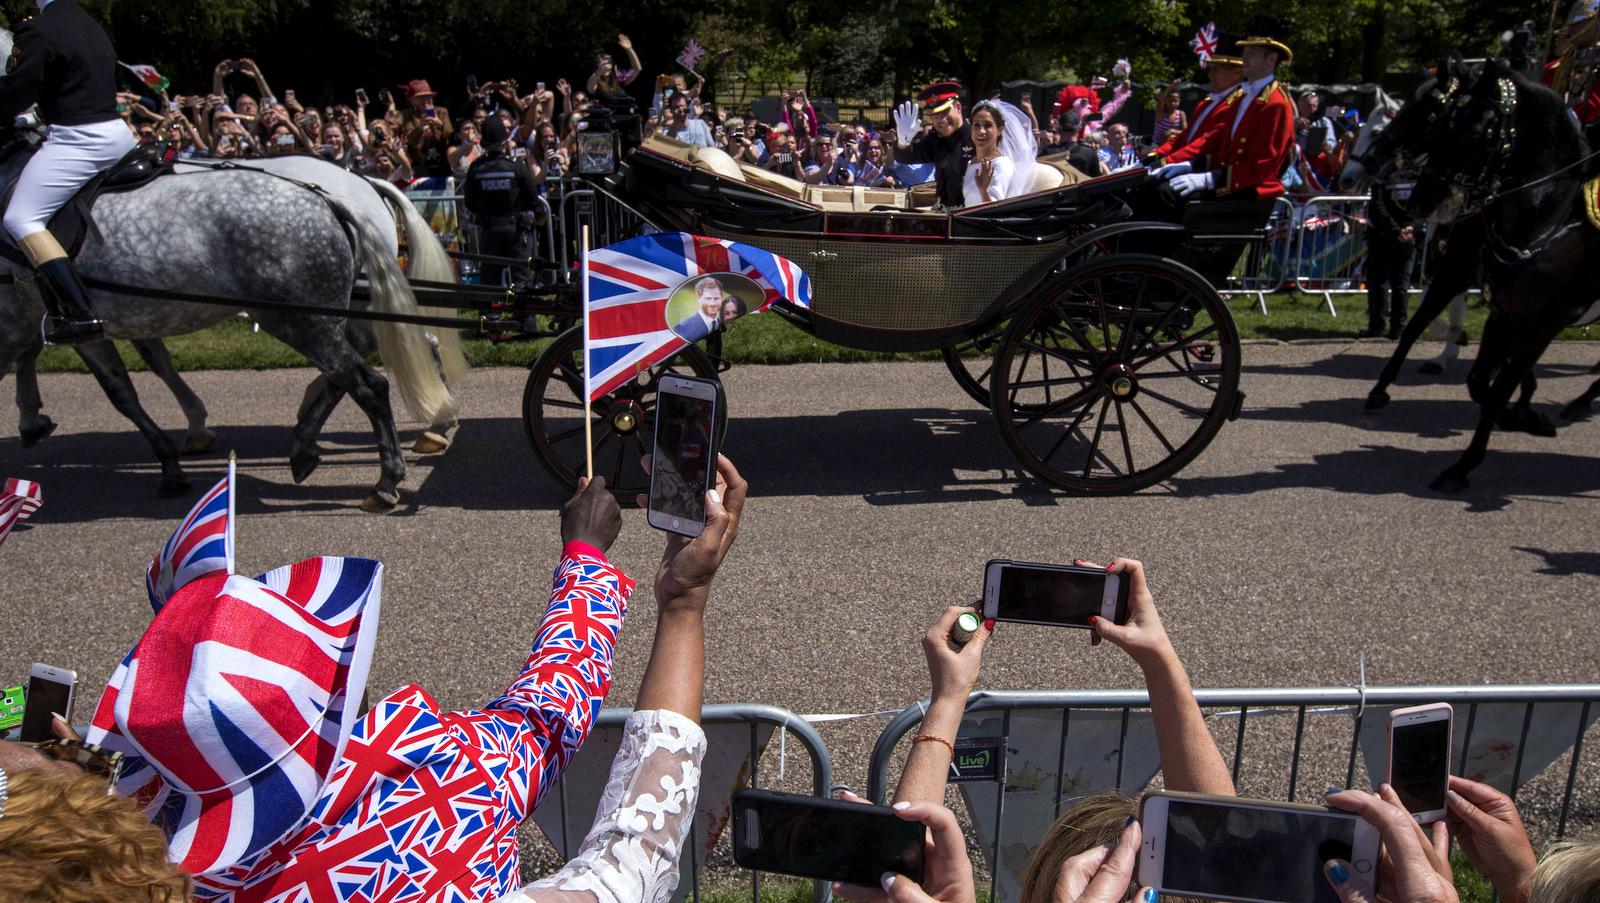 U.S. Media Coverage of Royal Wedding Was Stupid and Useless